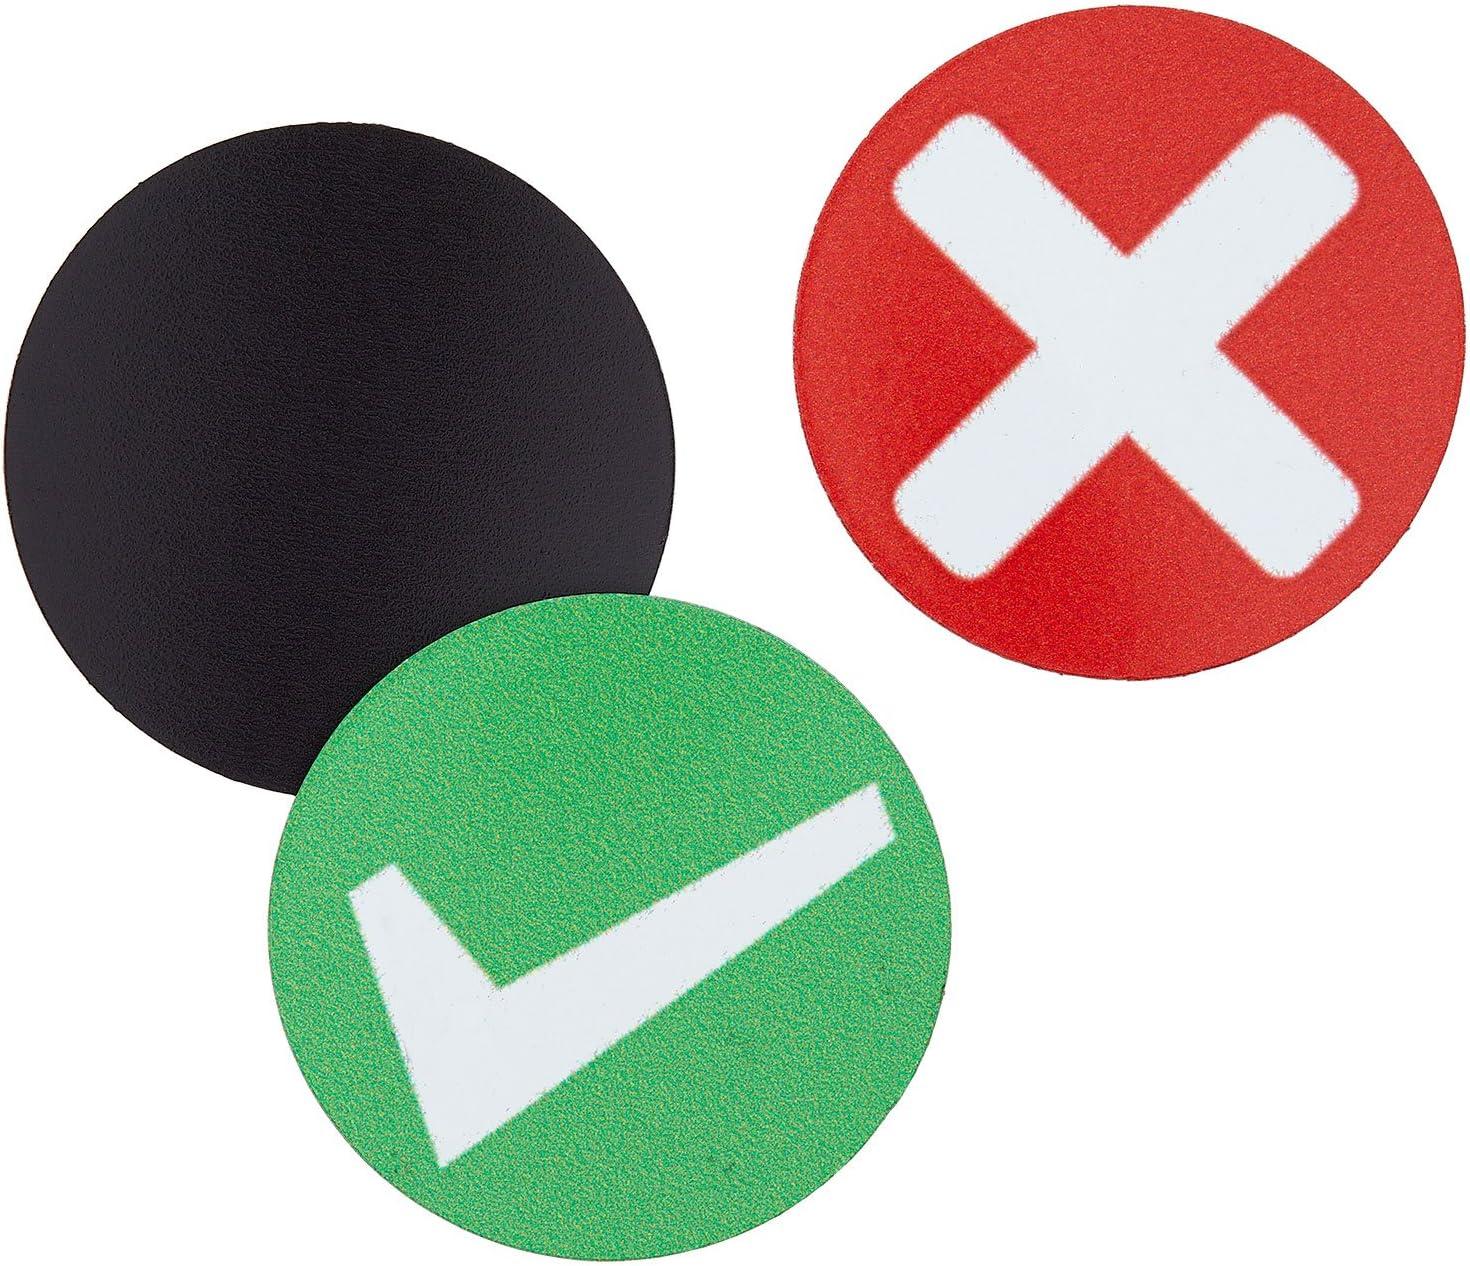 15 Bunte Magnetpfeile 5 Grüne Magnetpfeile 5 Gelbe Magnetpfeile Projektarbeit